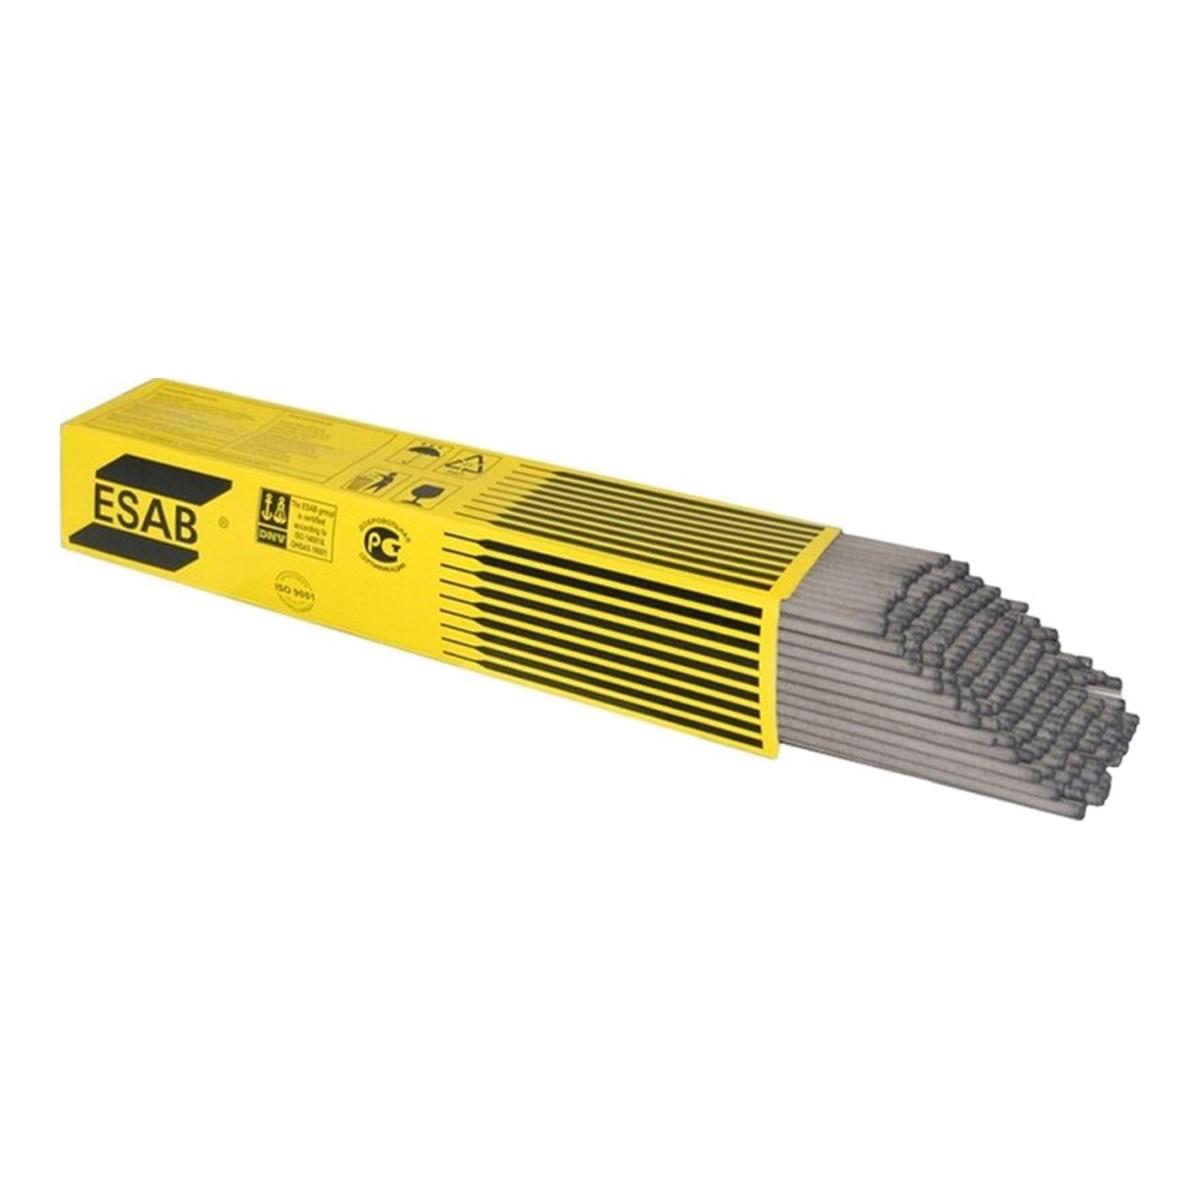 Электроды для сварки ESAB 2 мм ESAB-4600202WD0